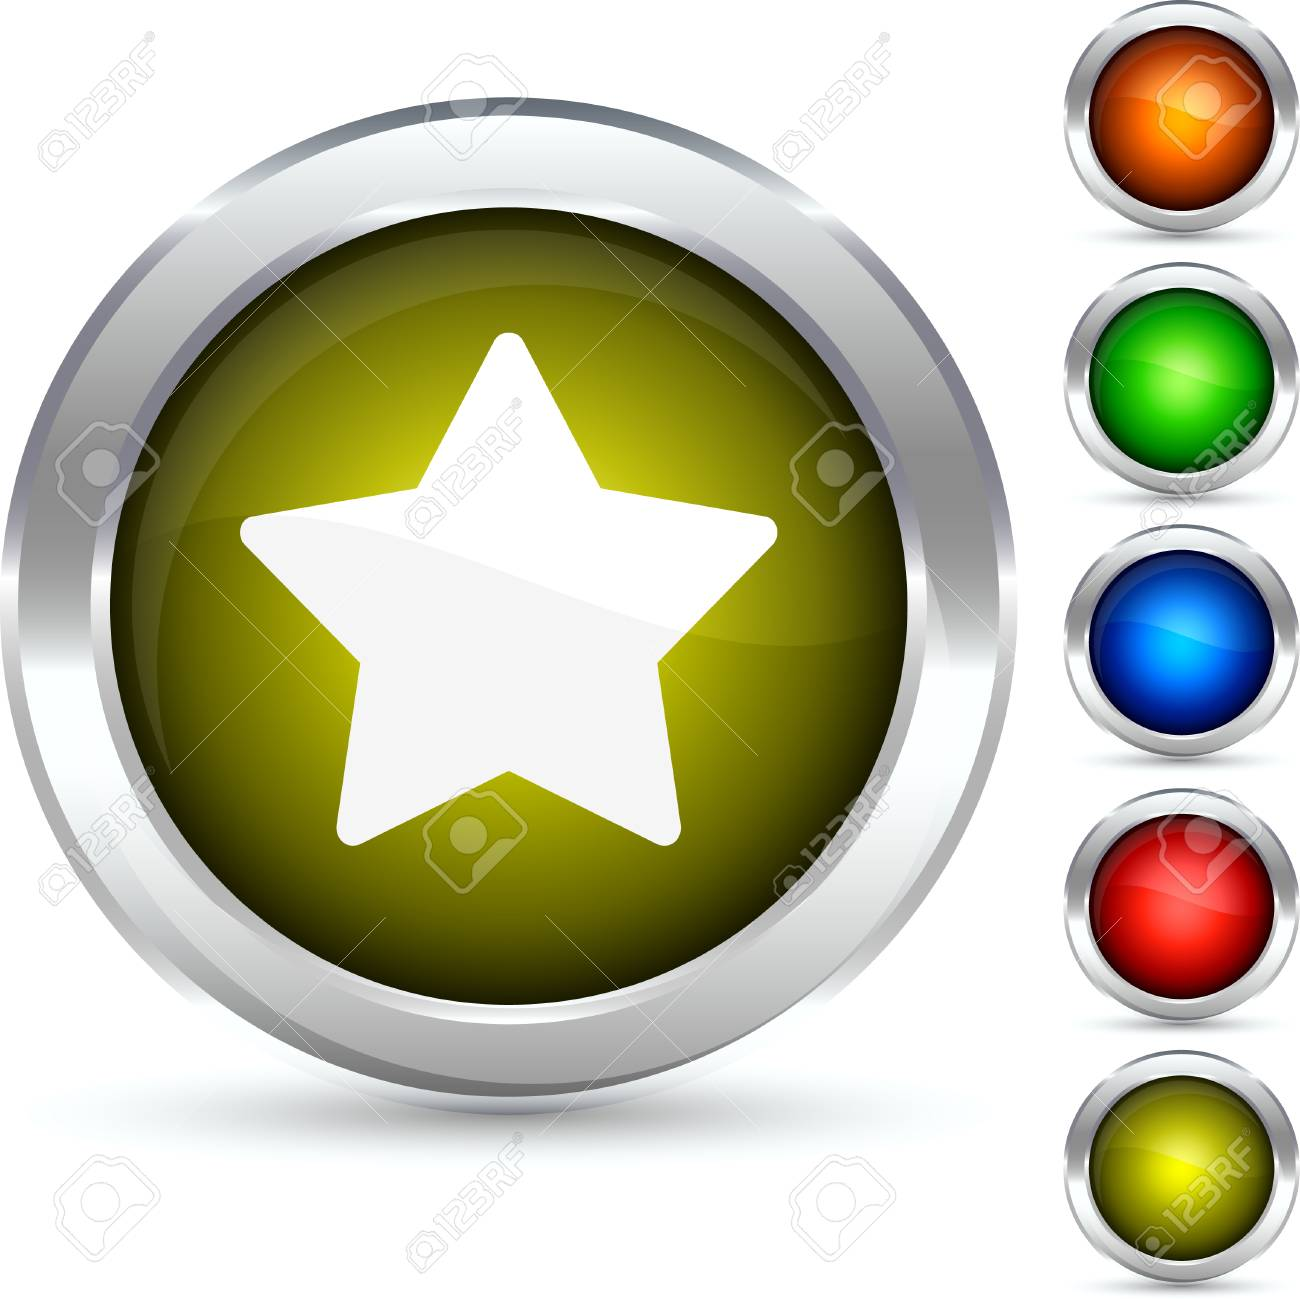 Star detailed button. Vector illustration. Stock Vector - 5298561